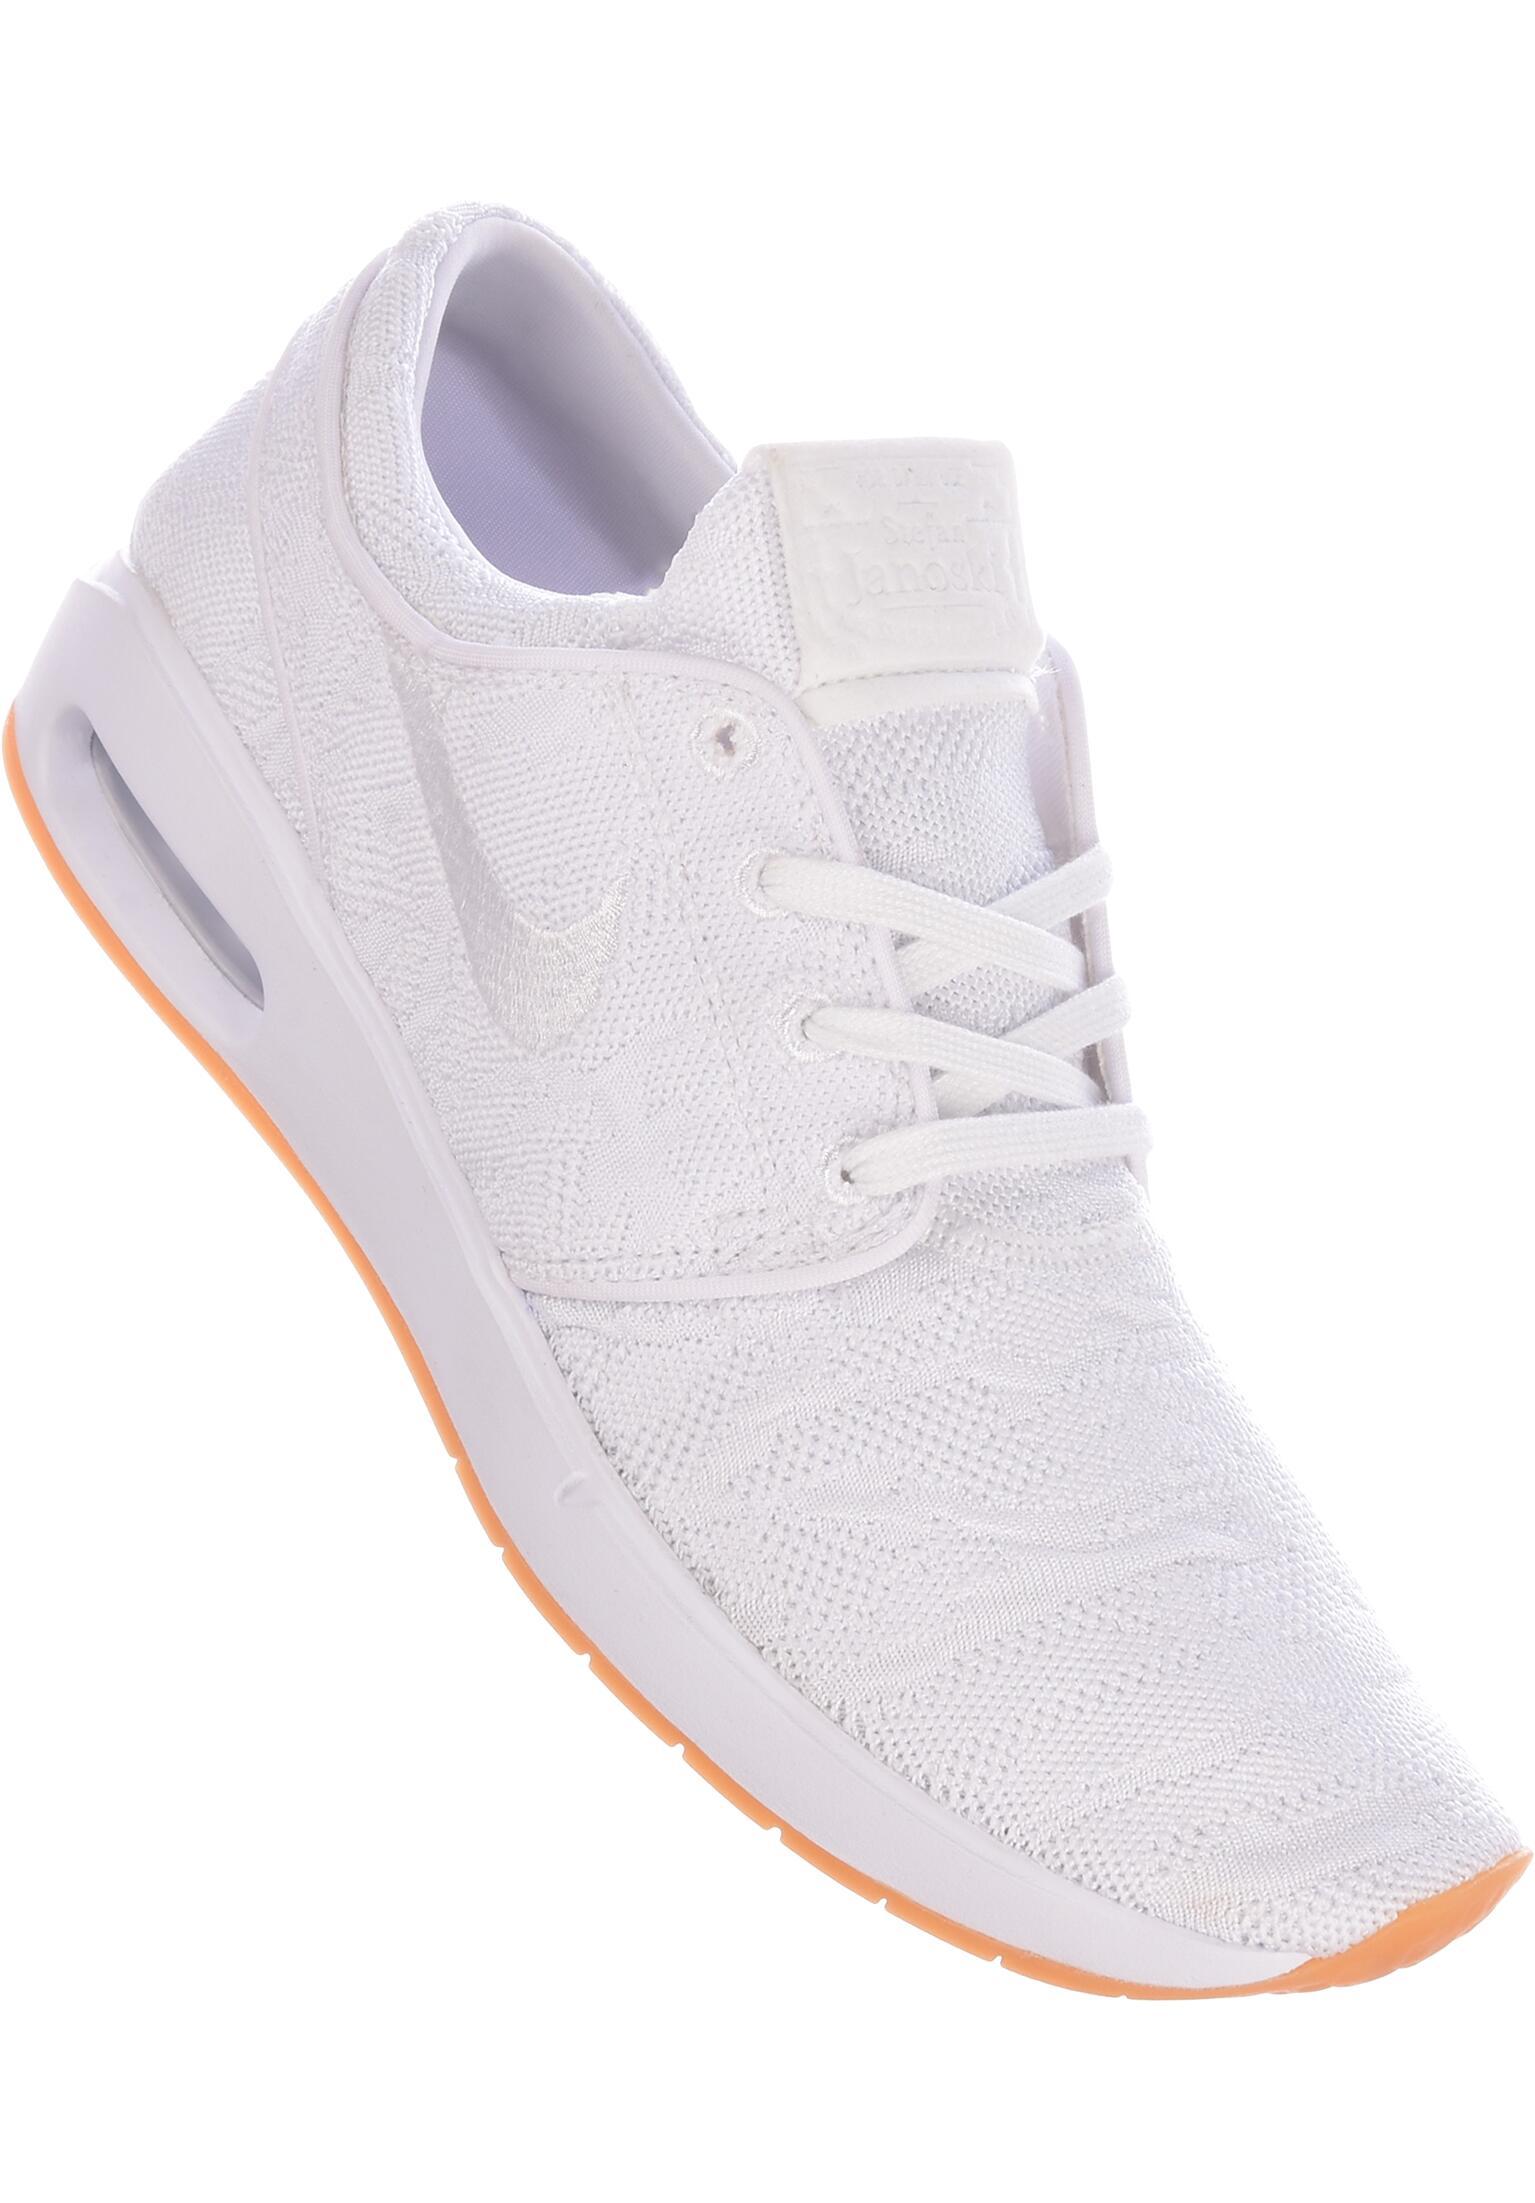 65c81619a3 Air Max Janoski 2 Nike SB All Shoes in white-white for Men   Titus